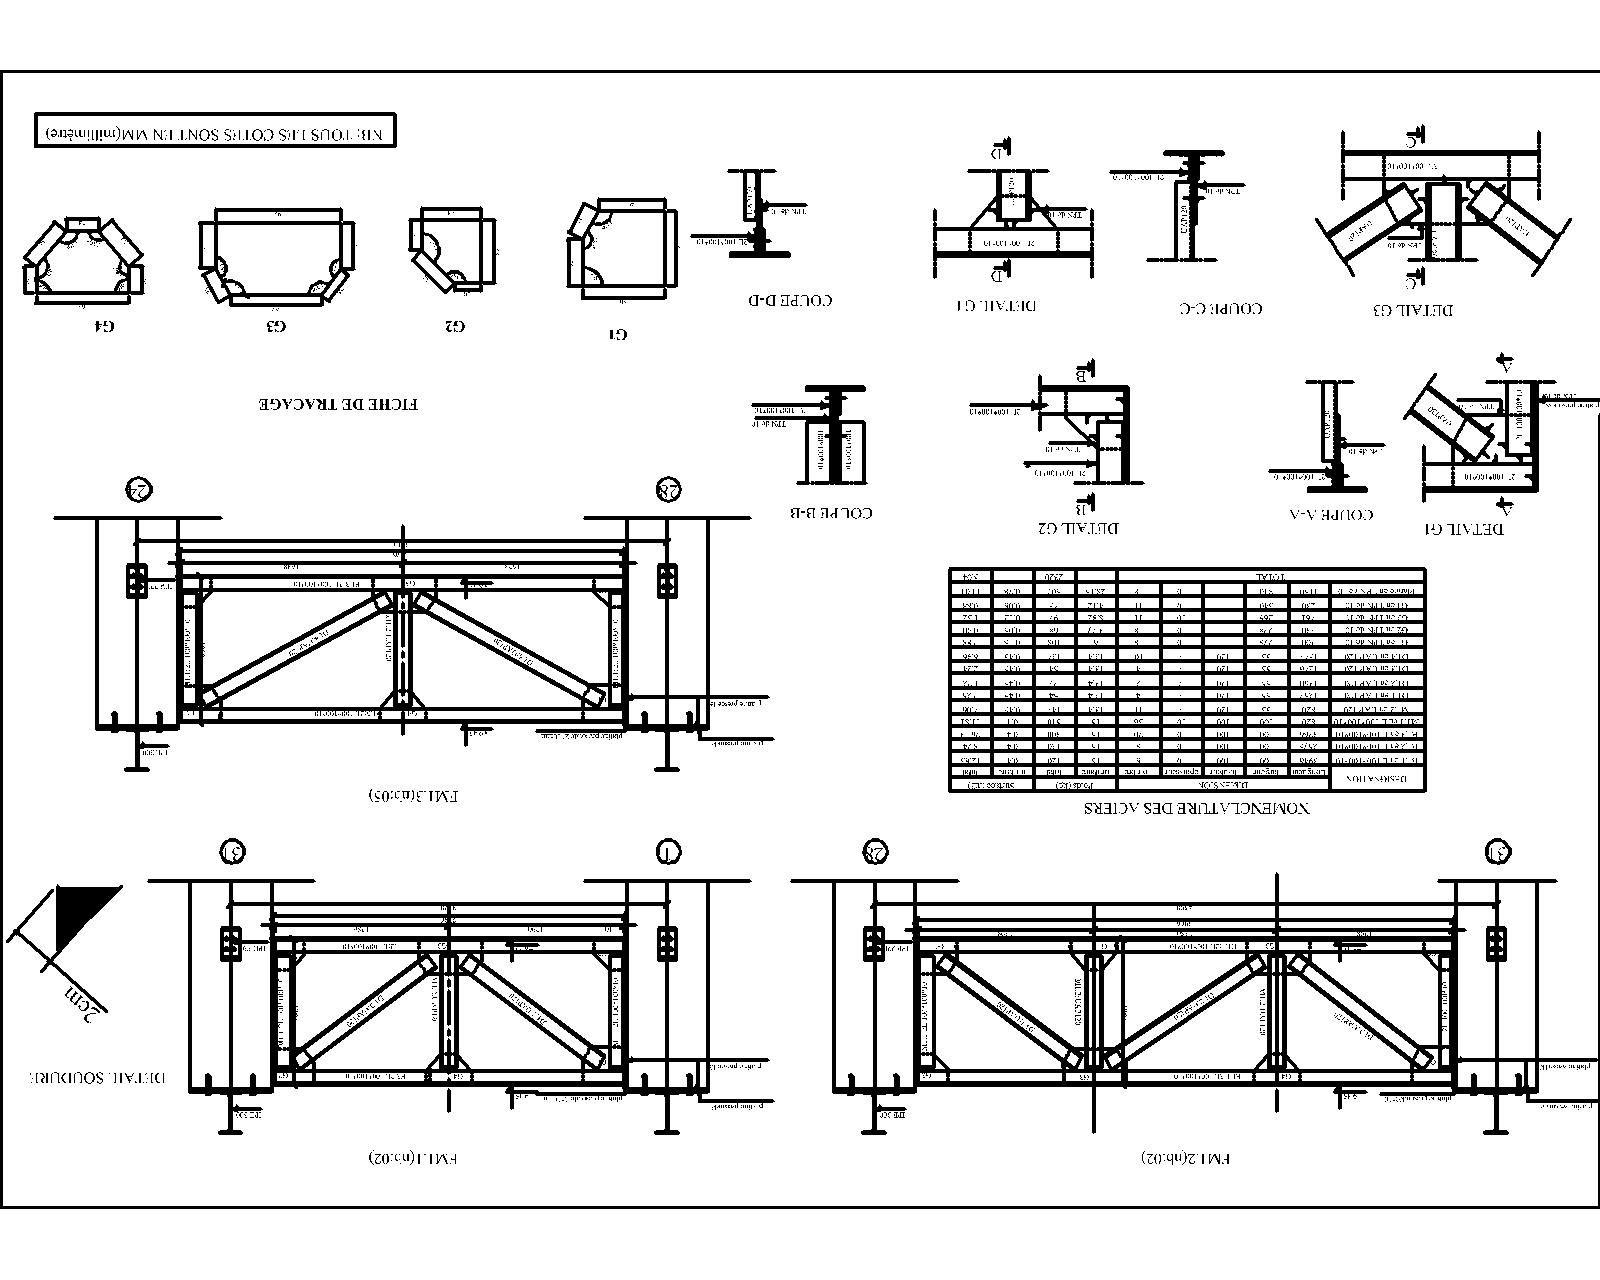 plan charpente metallique archi01 pinterest charpente m tallique charpente et metallique. Black Bedroom Furniture Sets. Home Design Ideas